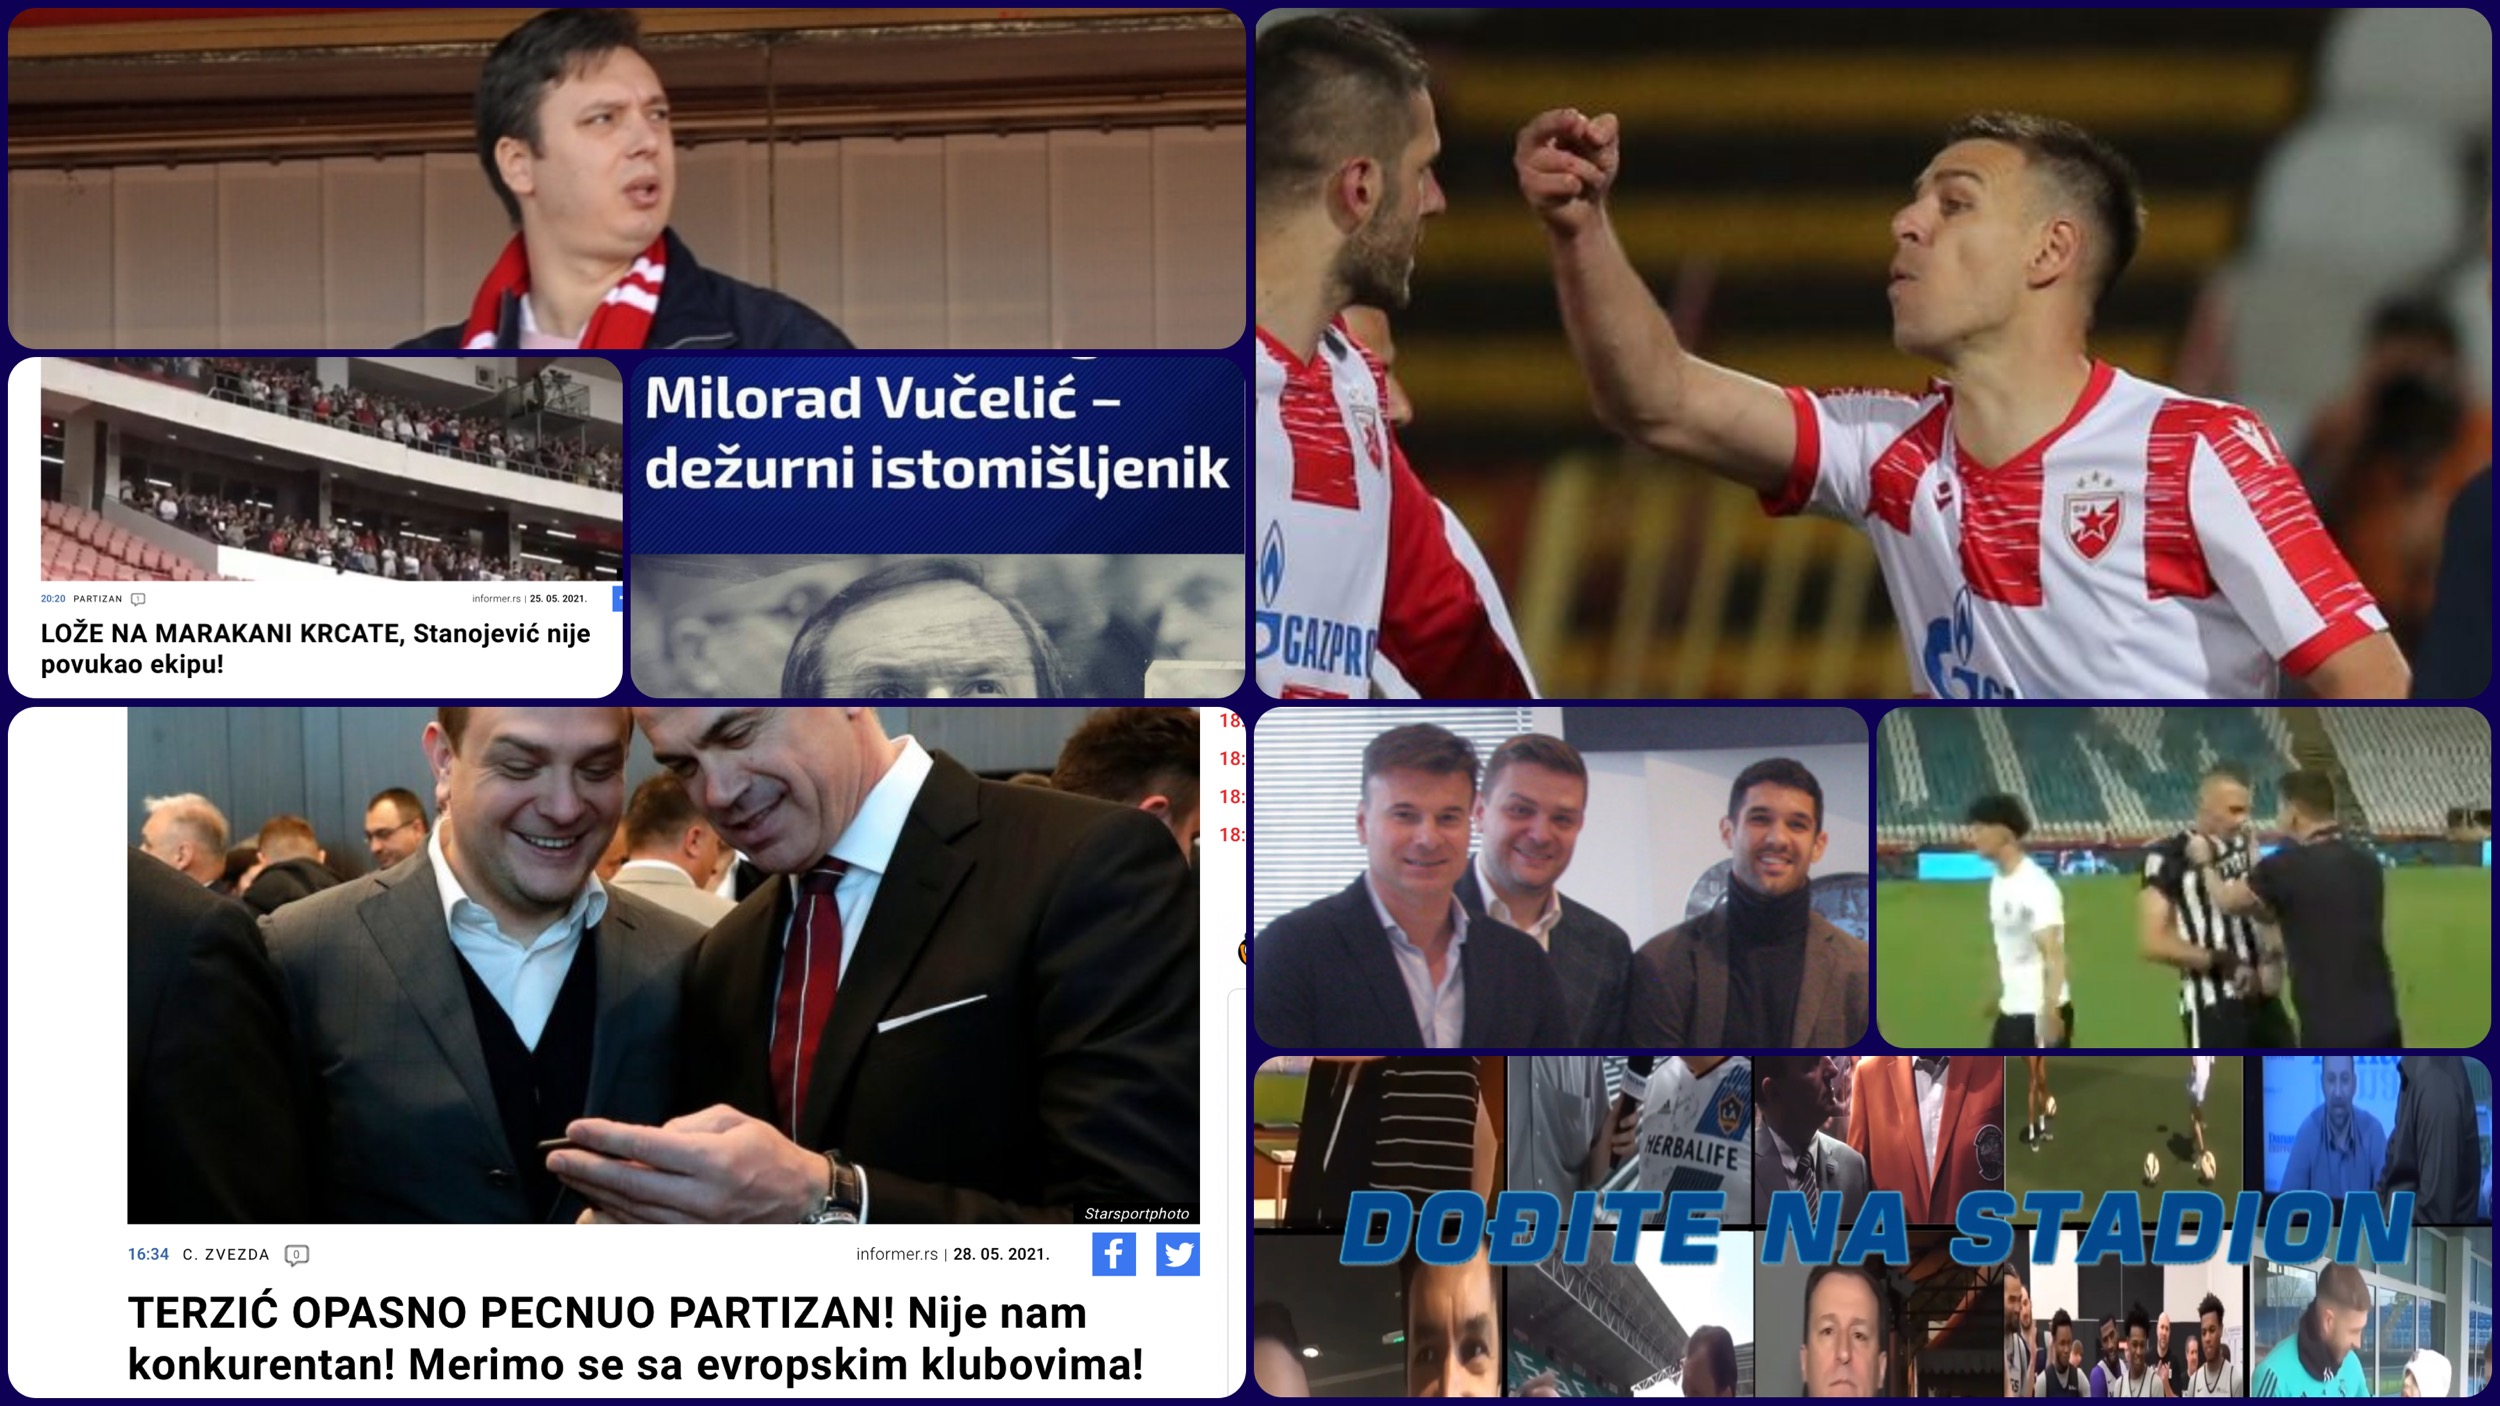 Dođite na stadion broj 419. Triplo golo nesmenjivog SNS trenera i Manitu doktora Terzića…(VIDEO)